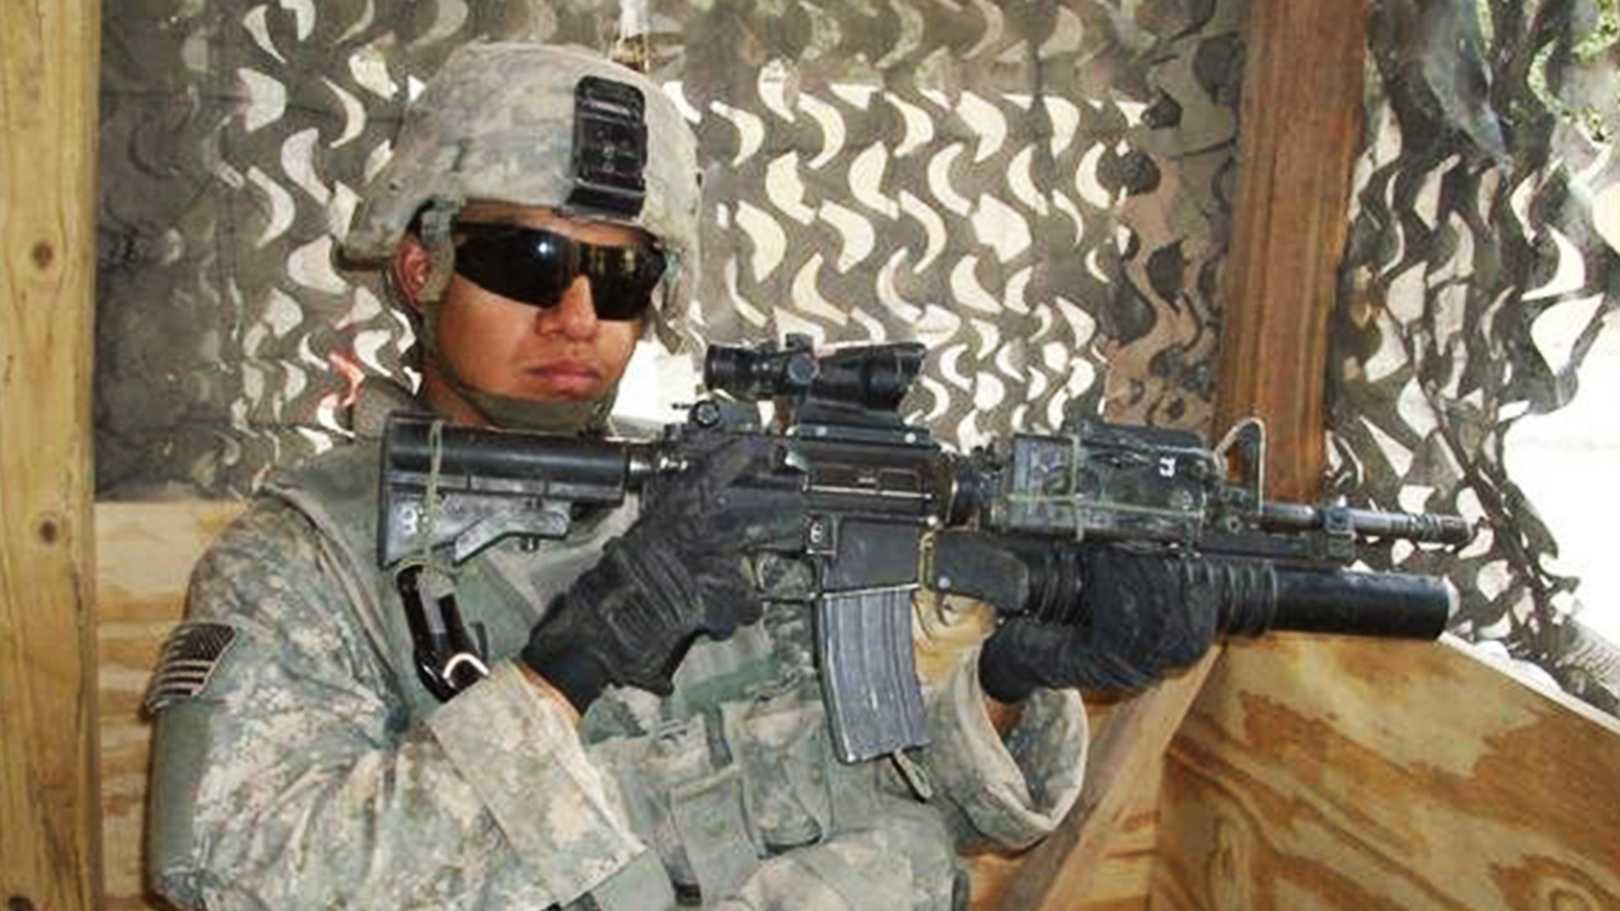 Greenfield solider army2.jpg